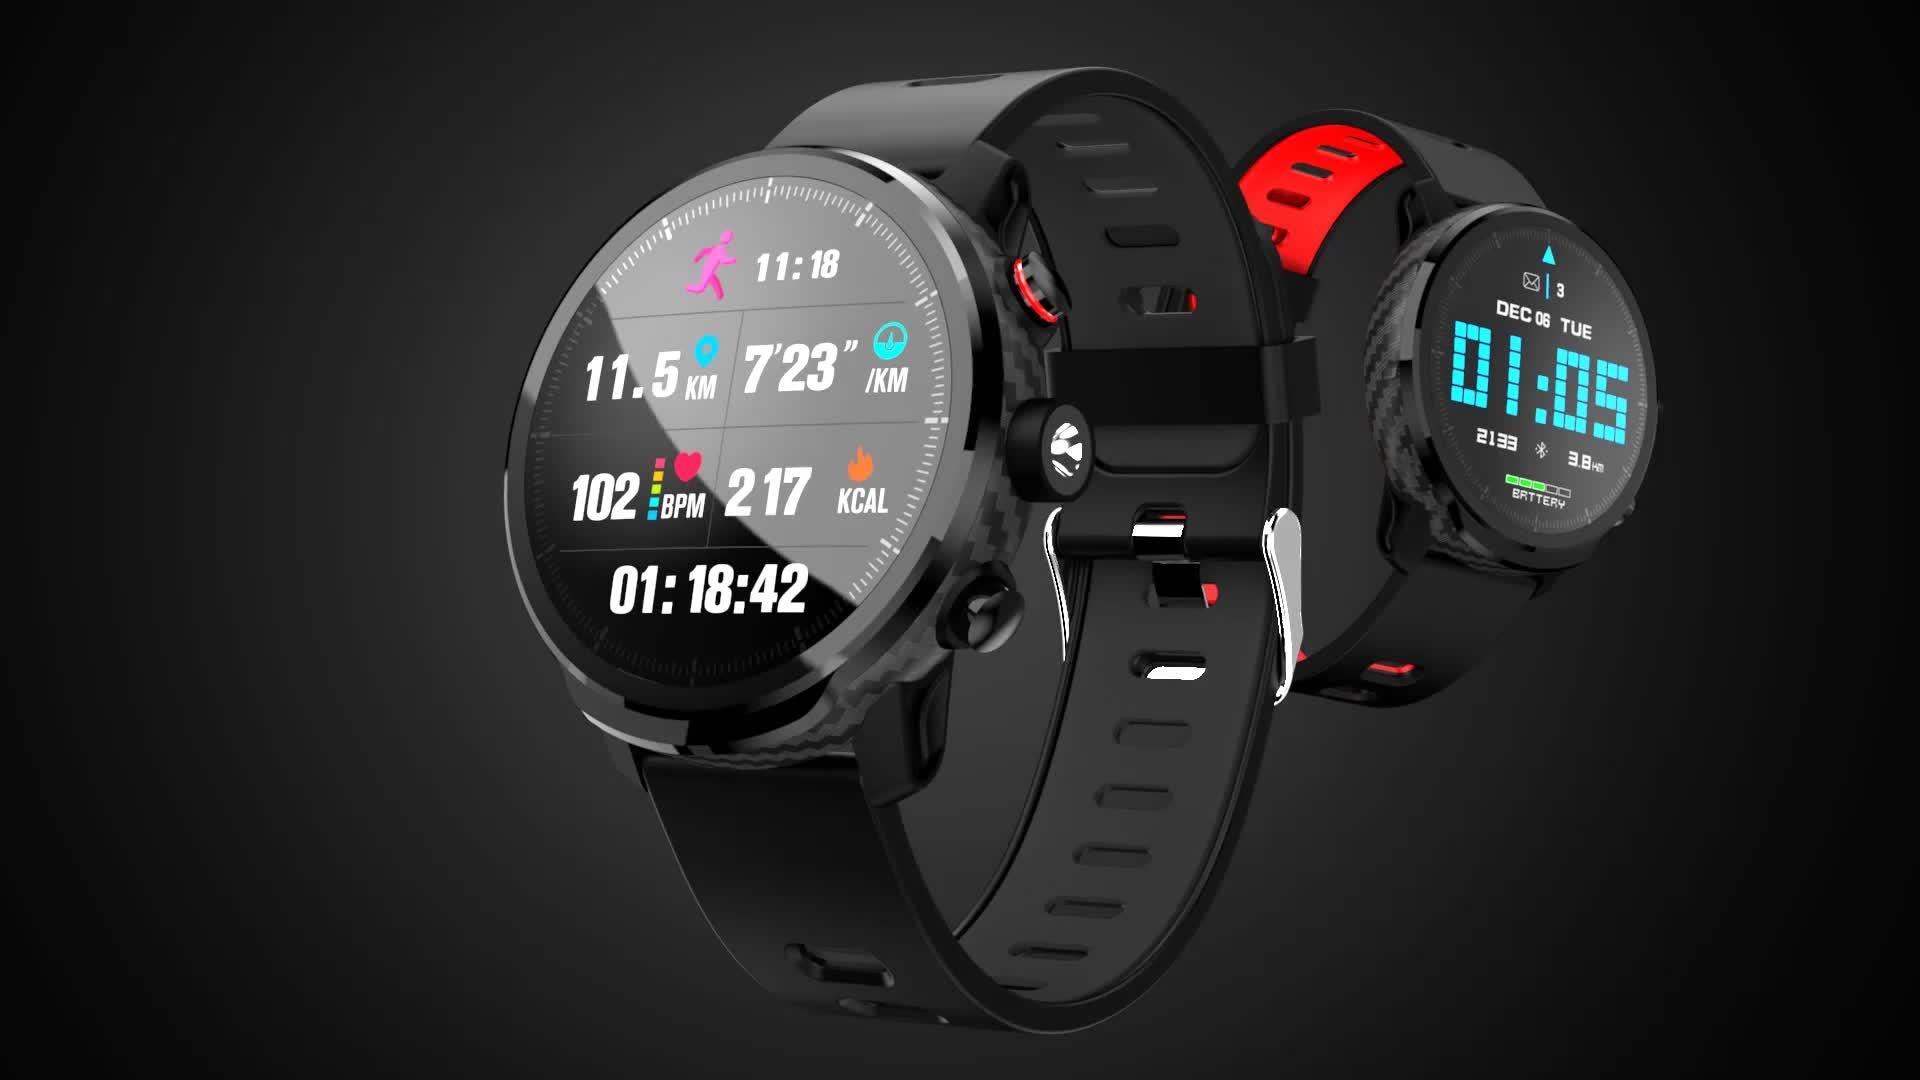 Microwear स्मार्ट घड़ी L5 उच्च गुणवत्ता पूर्ण टच दौर IP68 निविड़ अंधकार दिल दर बीपी चरणों खेल lemfo ब्लूटूथ स्मार्ट बैंड